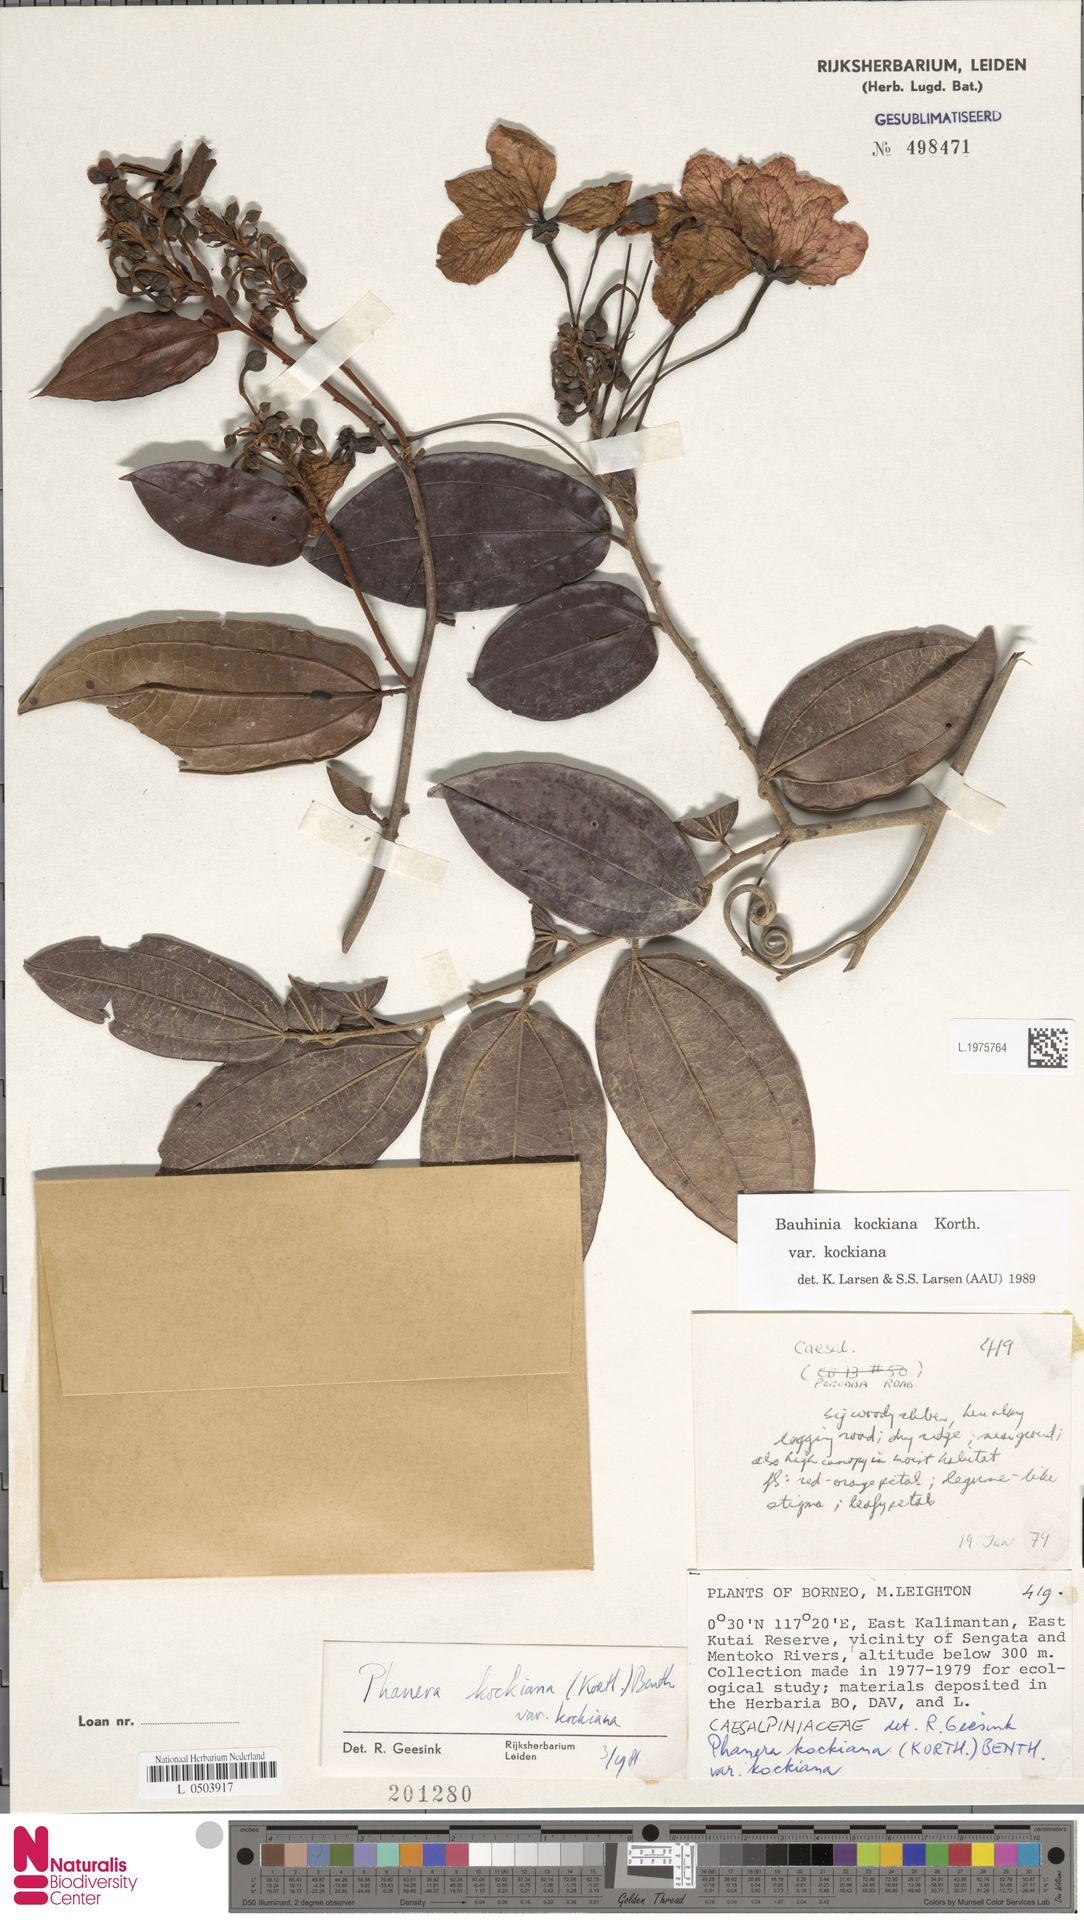 L.1975764 | Bauhinia kockiana var. kockiana